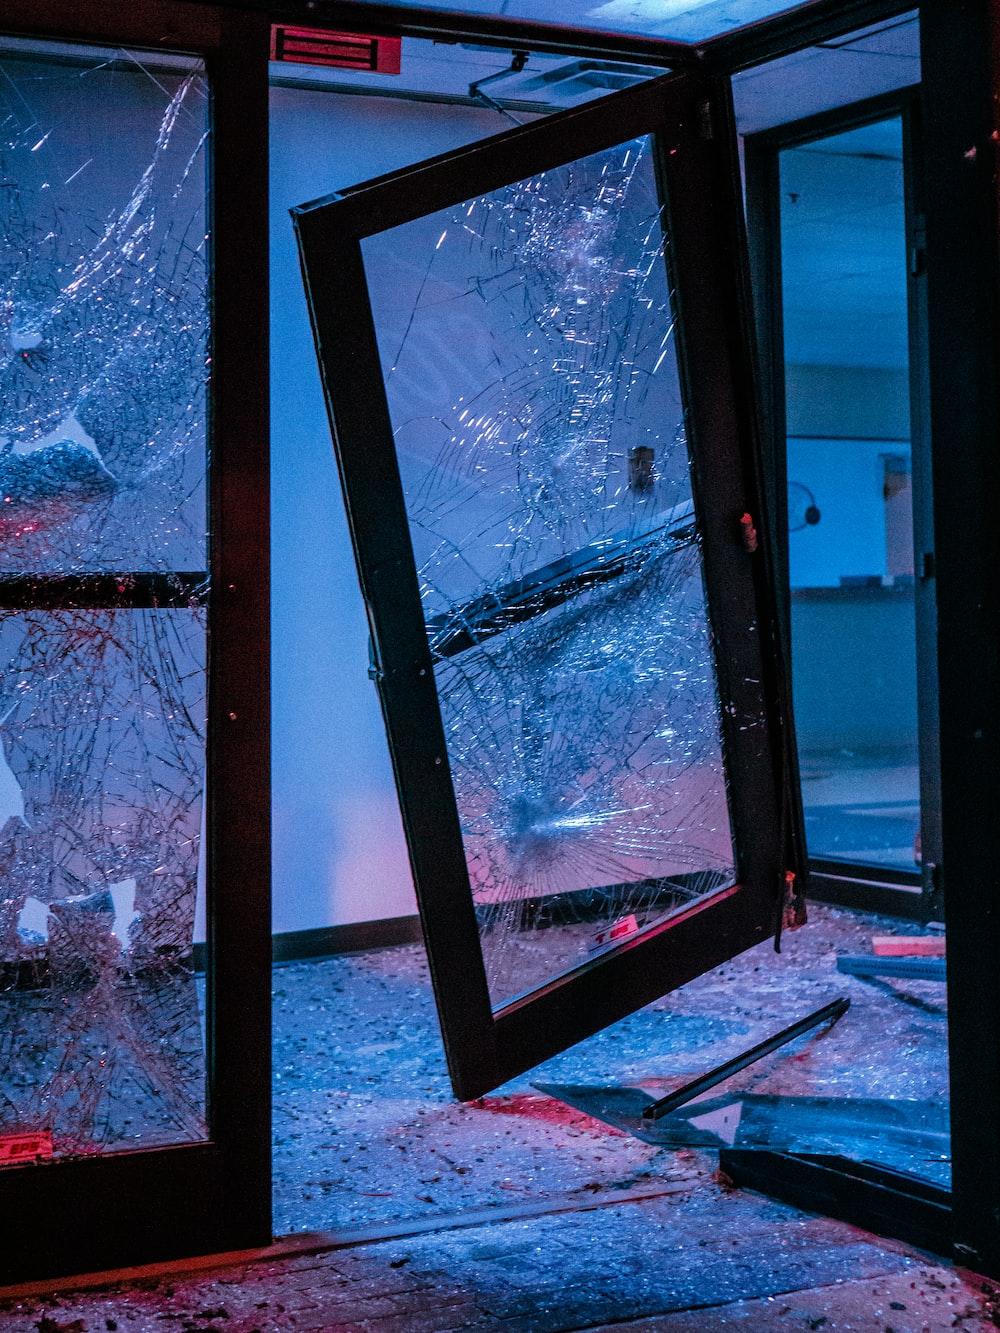 black framed glass window with white snow